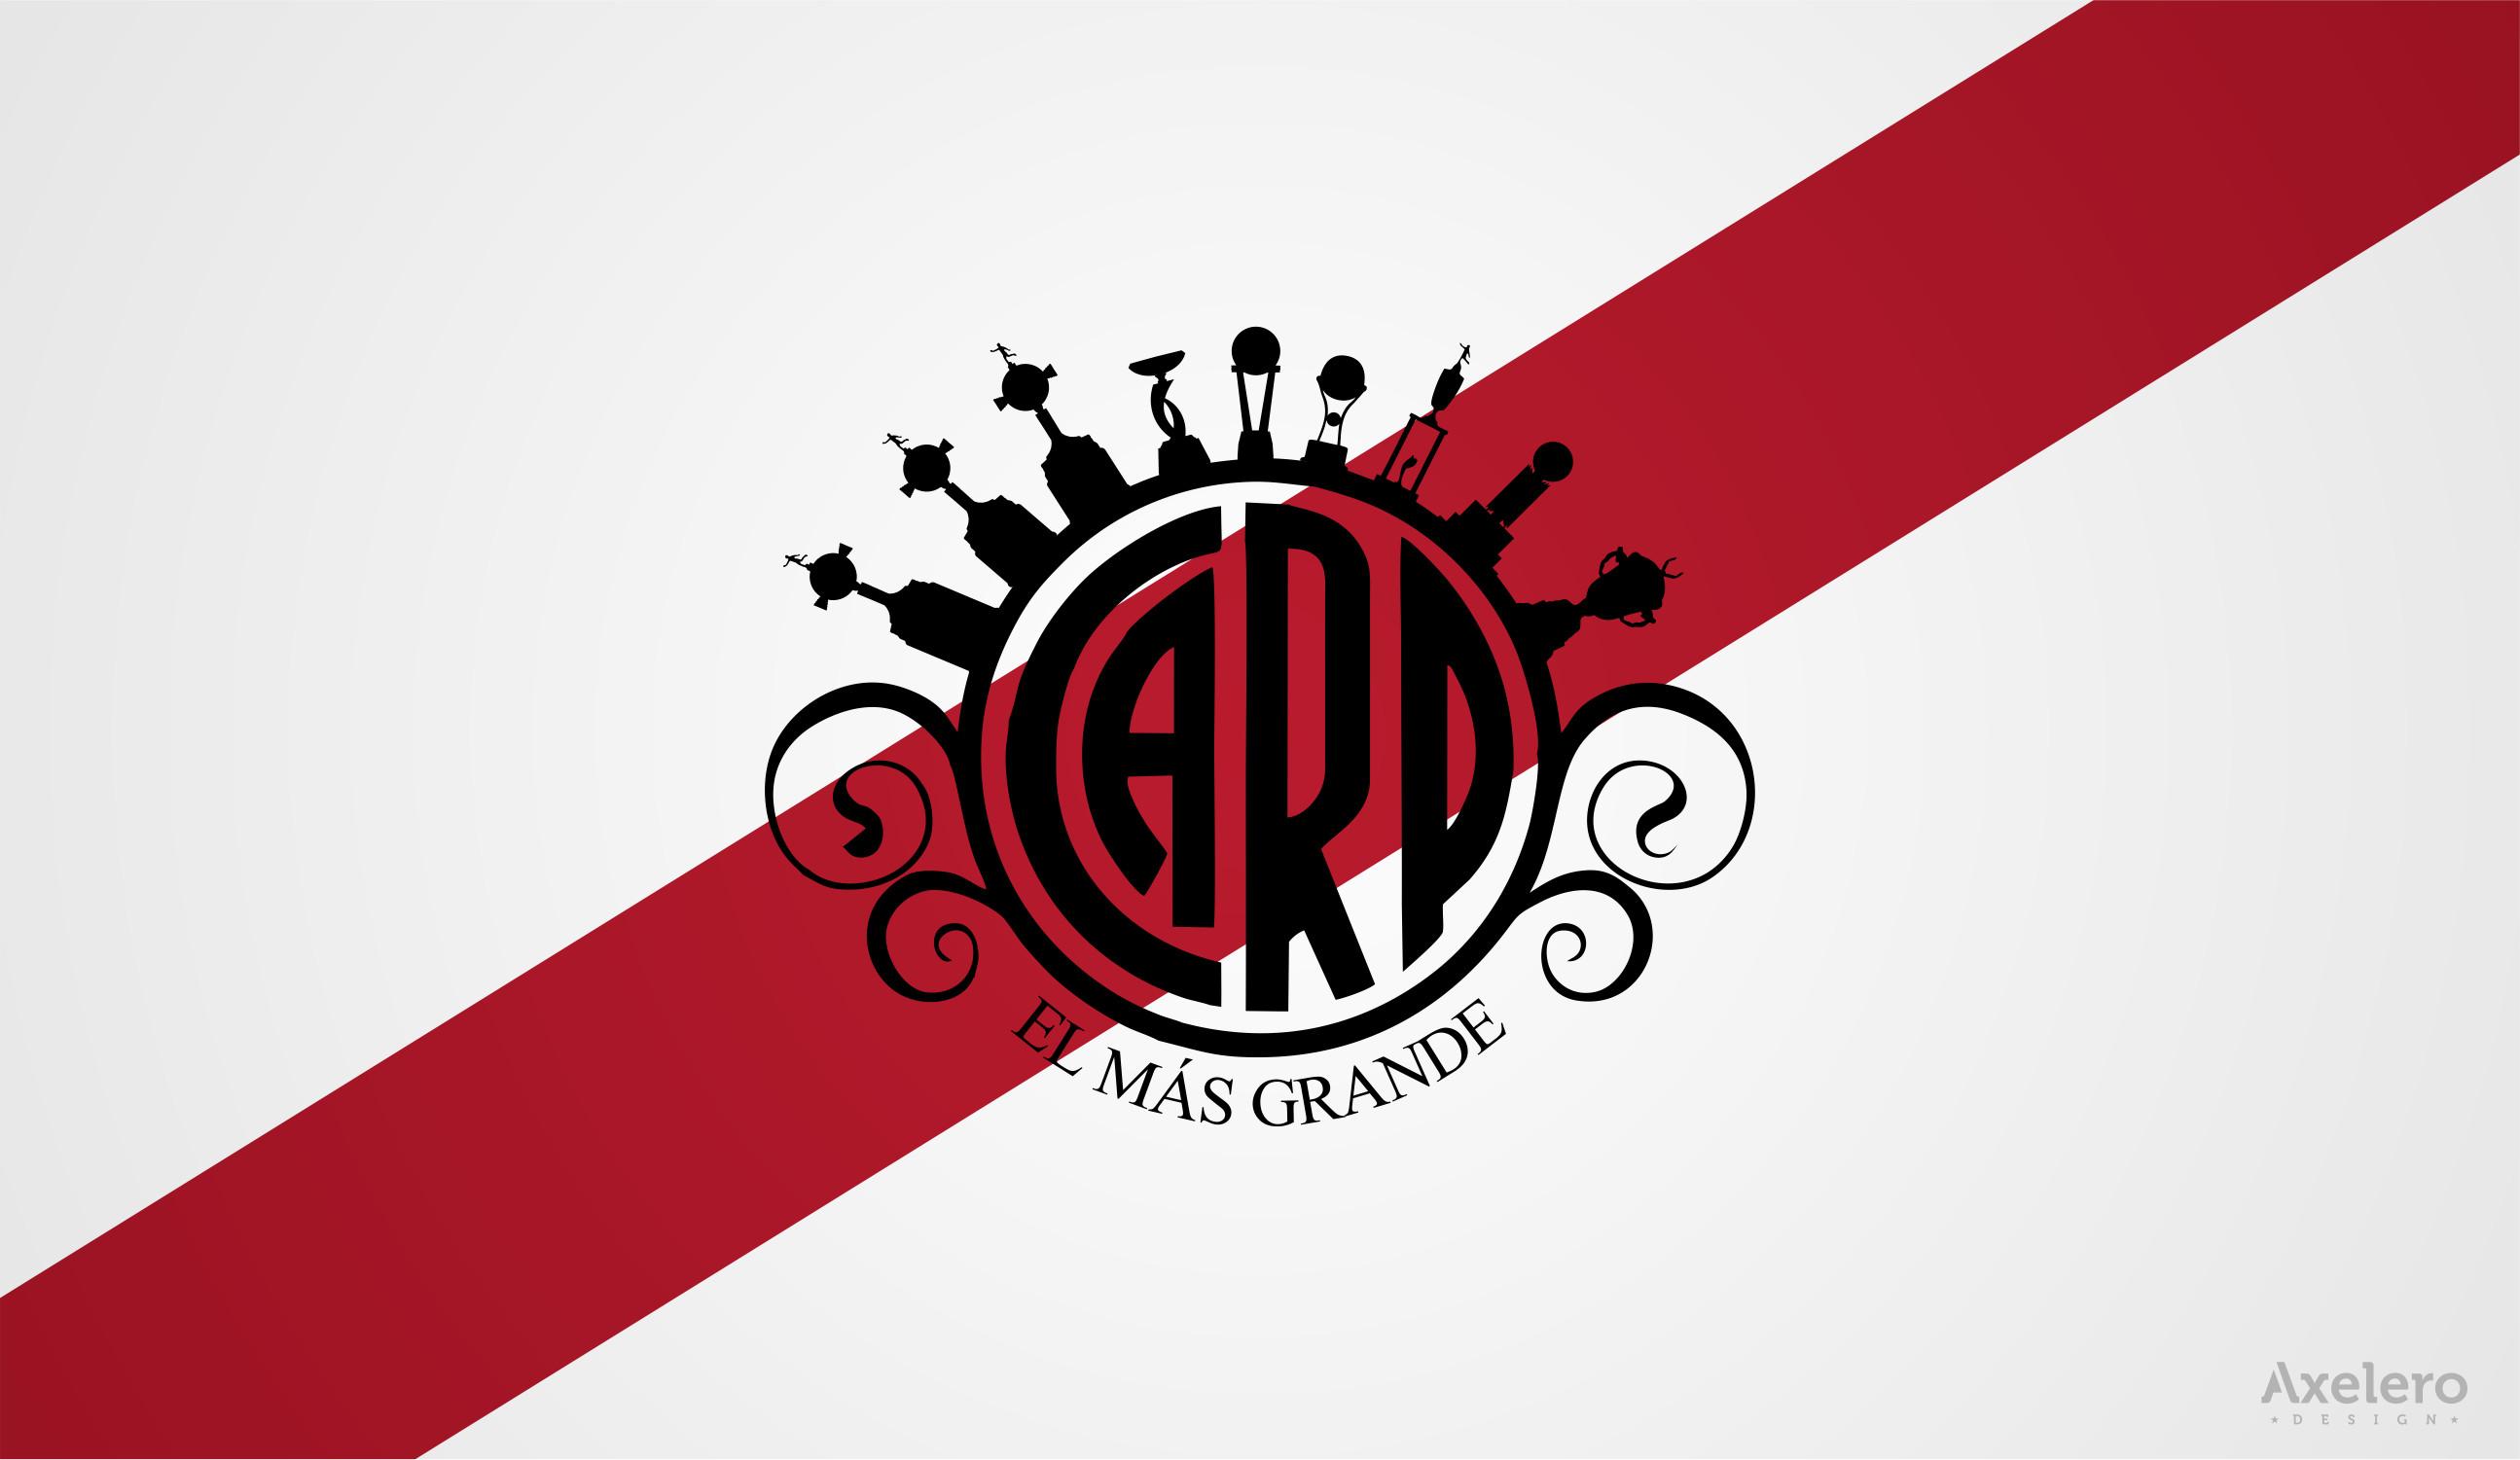 Niederlande Infos Pictures Of River Plate Wallpapers